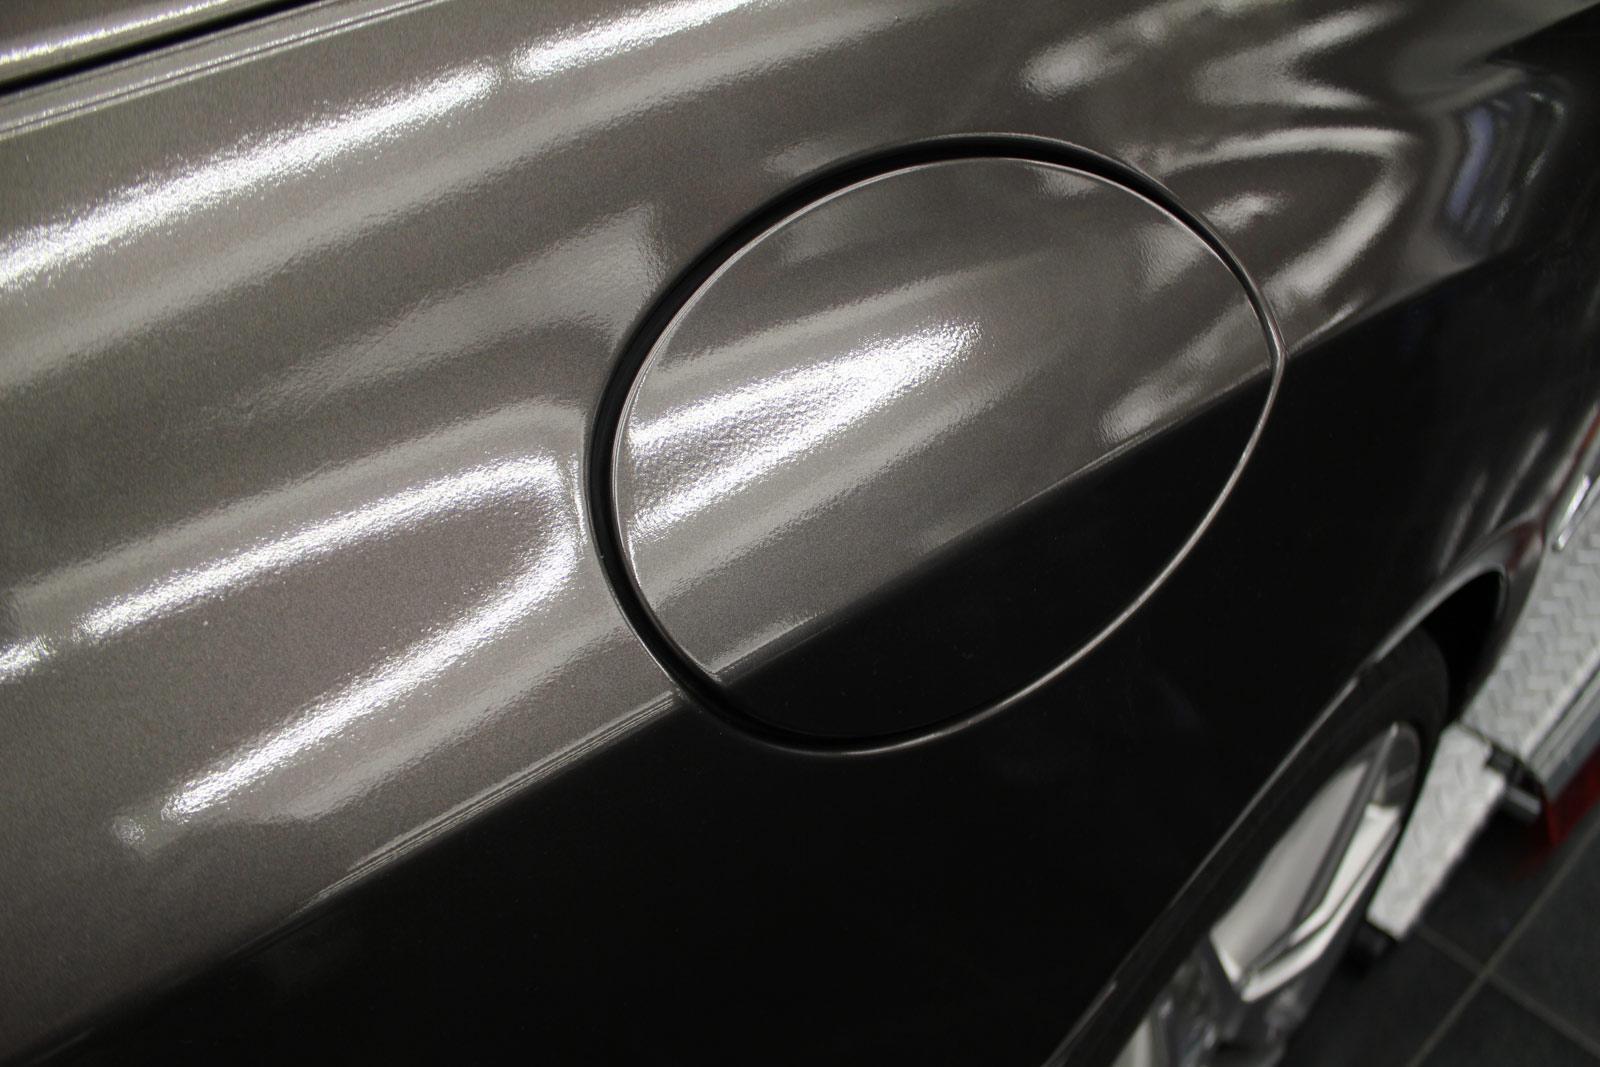 Mercedes_E-Klasse_Cabrio_Folierung_Stannitgrau_Metallic_Glanz_18